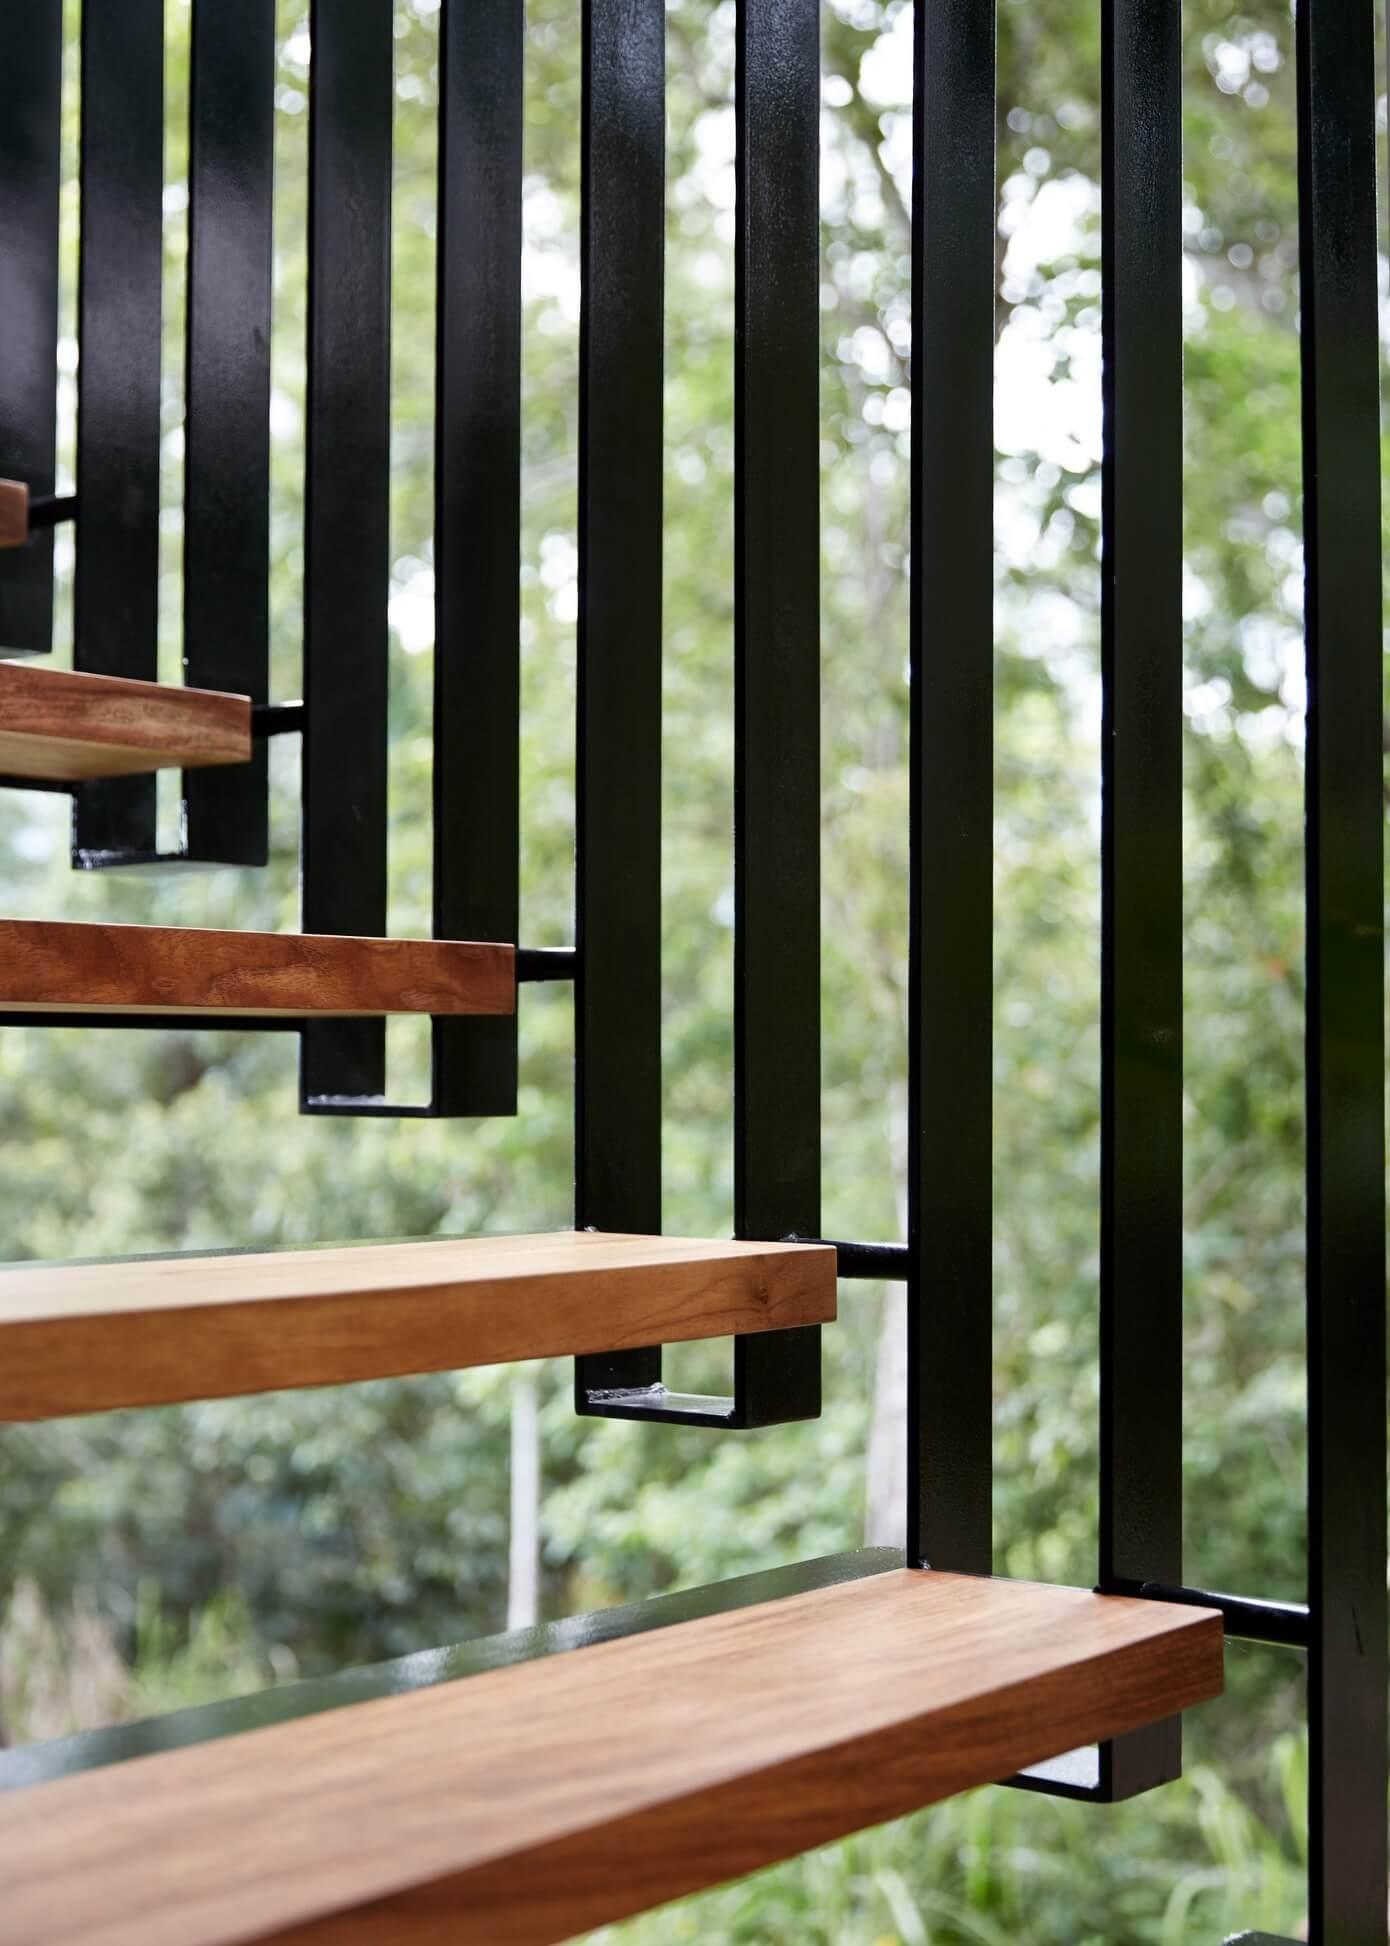 planchonella-house-jesse-bennett-architect-11